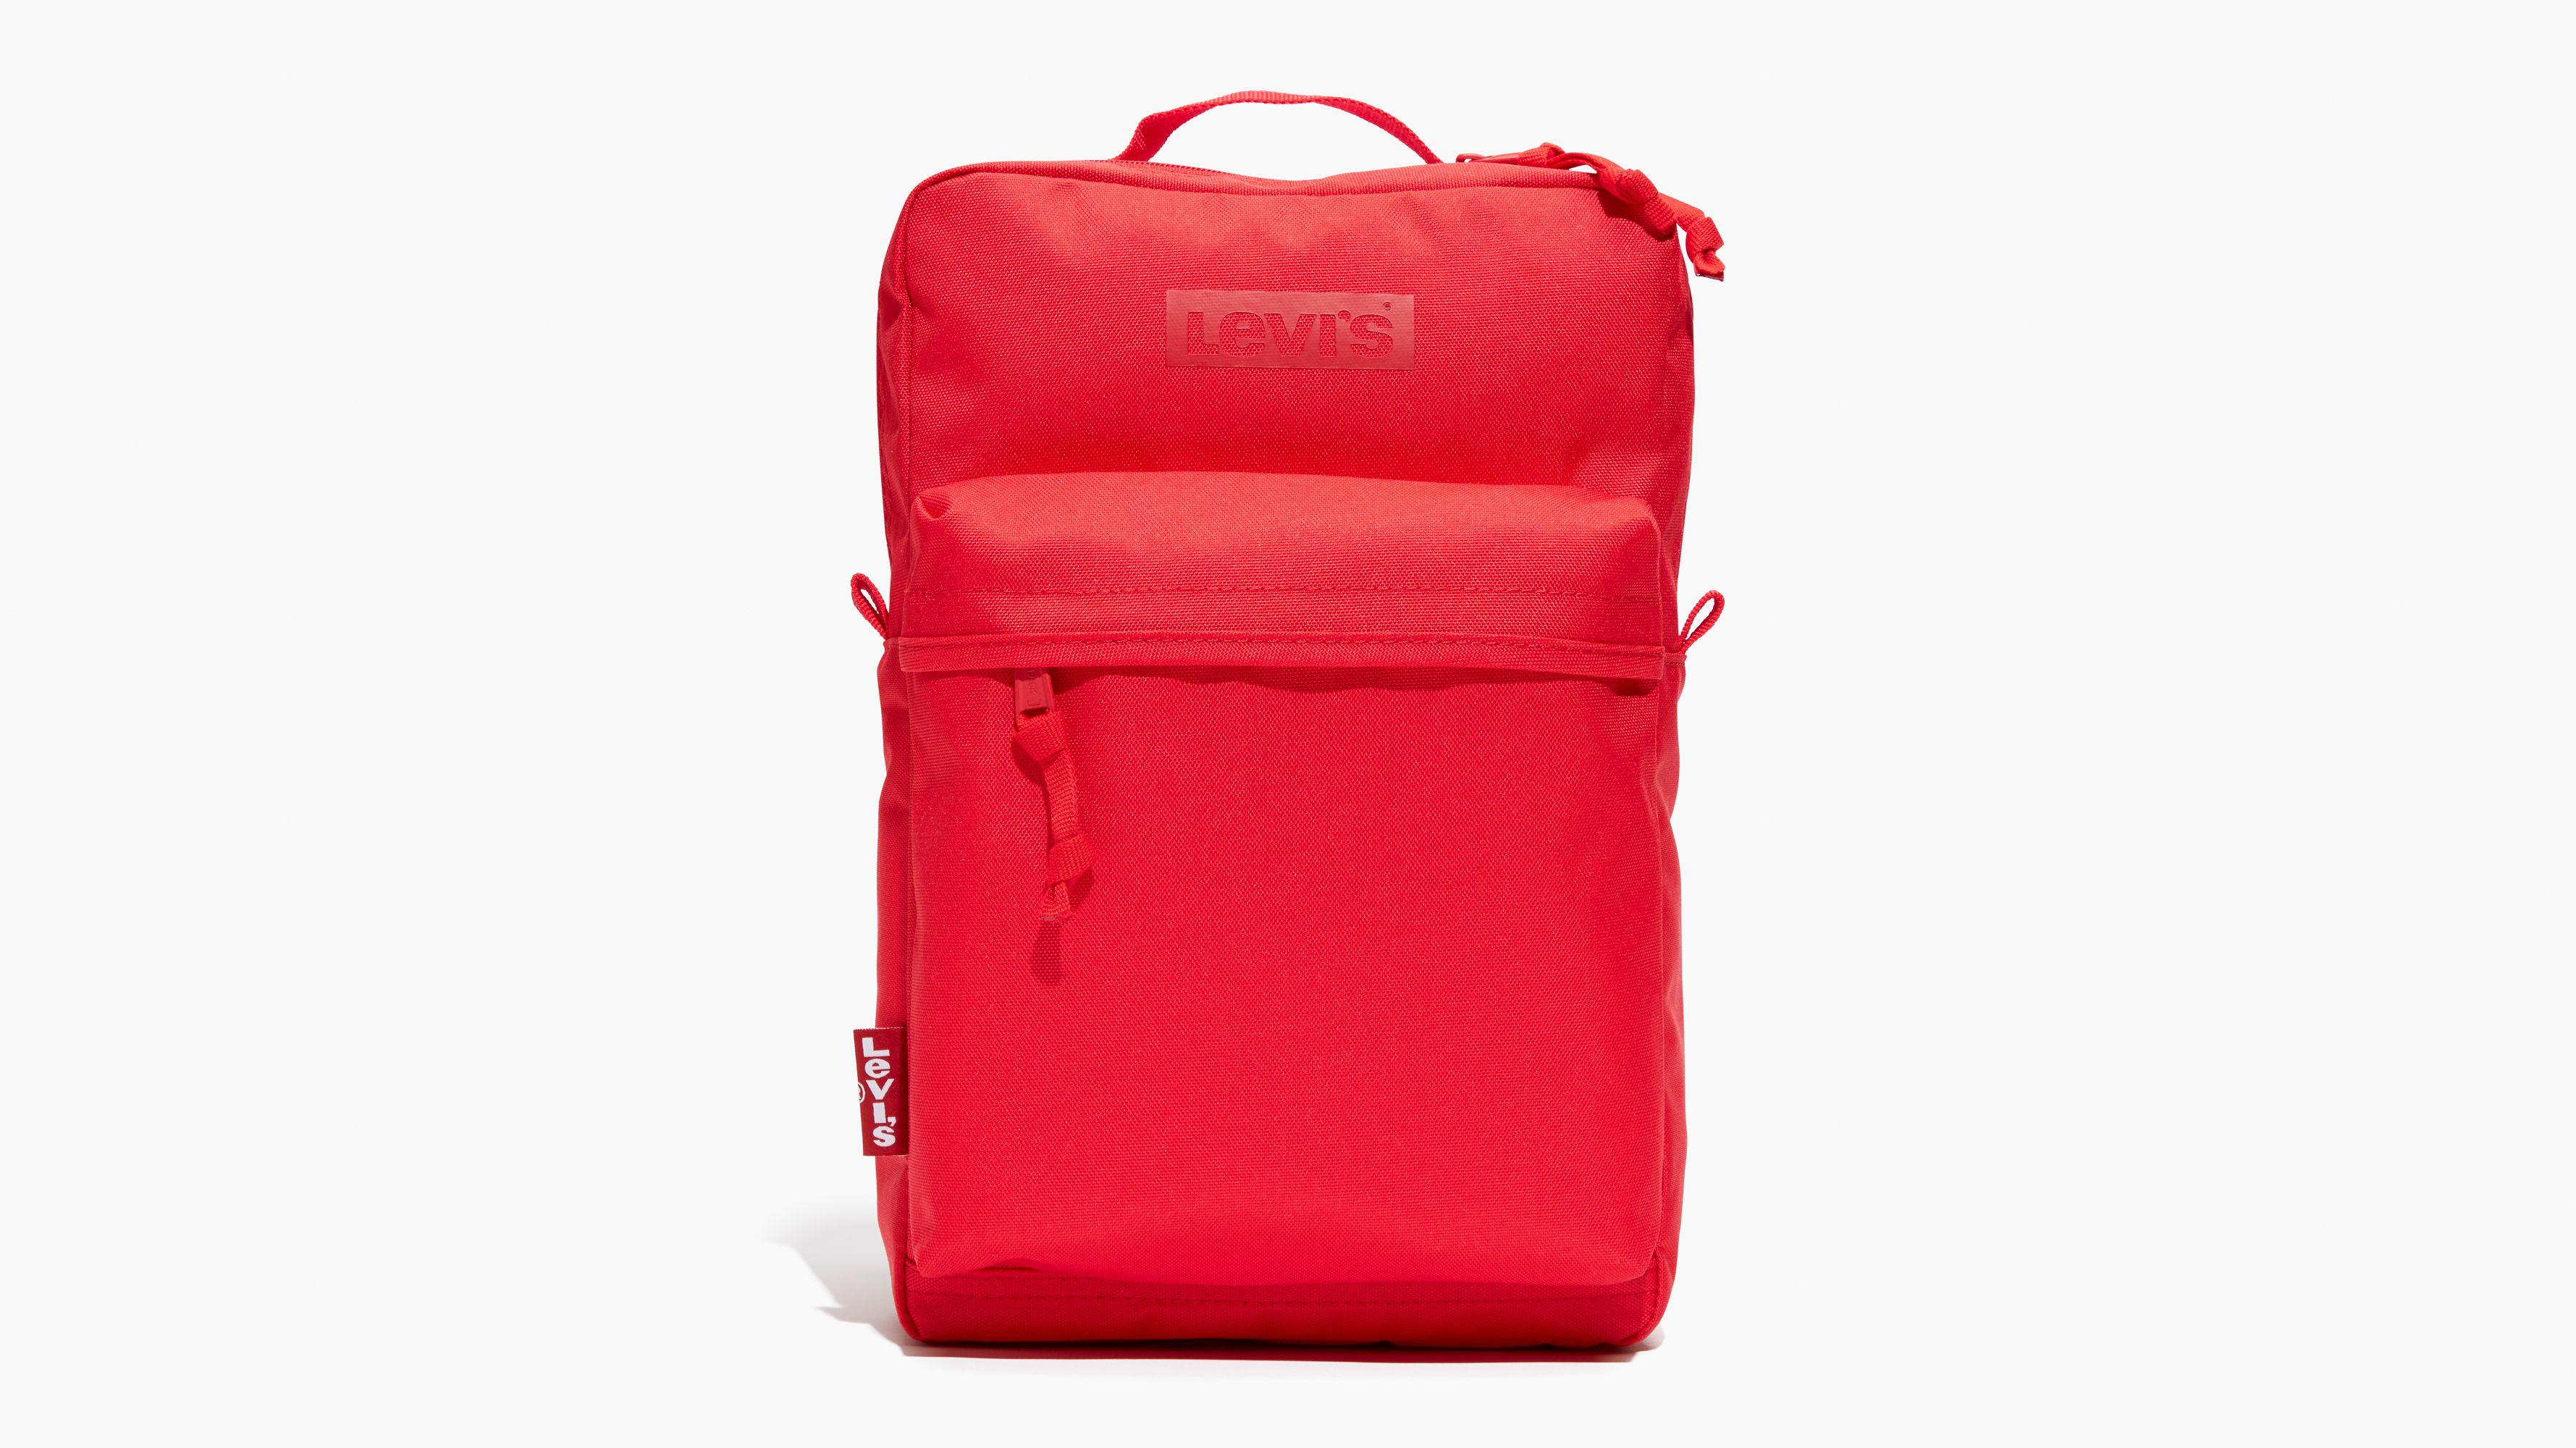 Levi's00ae L Pack Mini